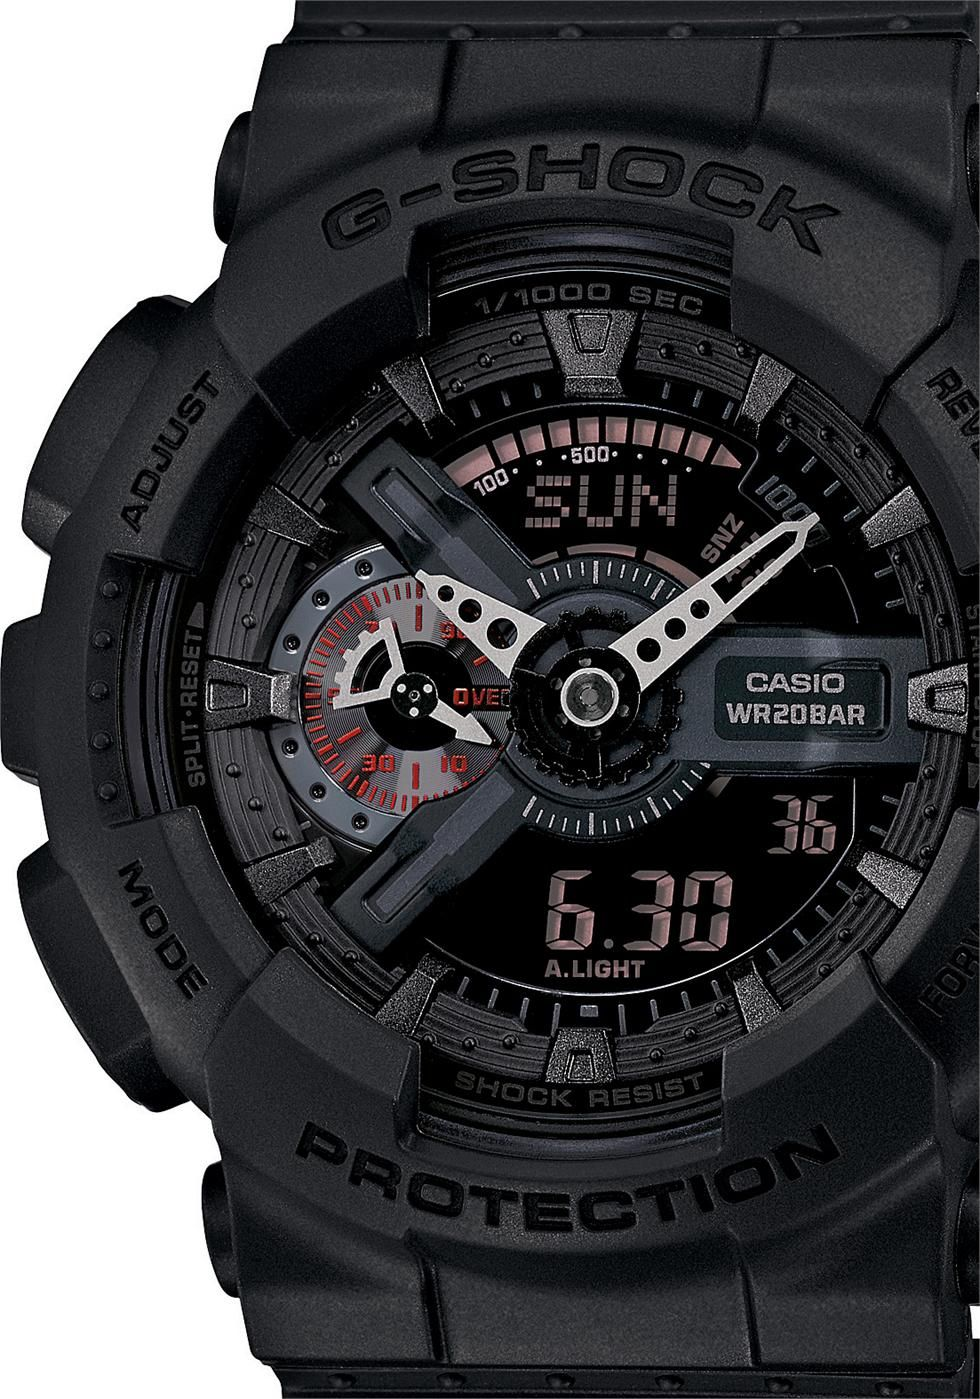 da5dcaeee10 G-Shock Classic Military X-Large Matte Black